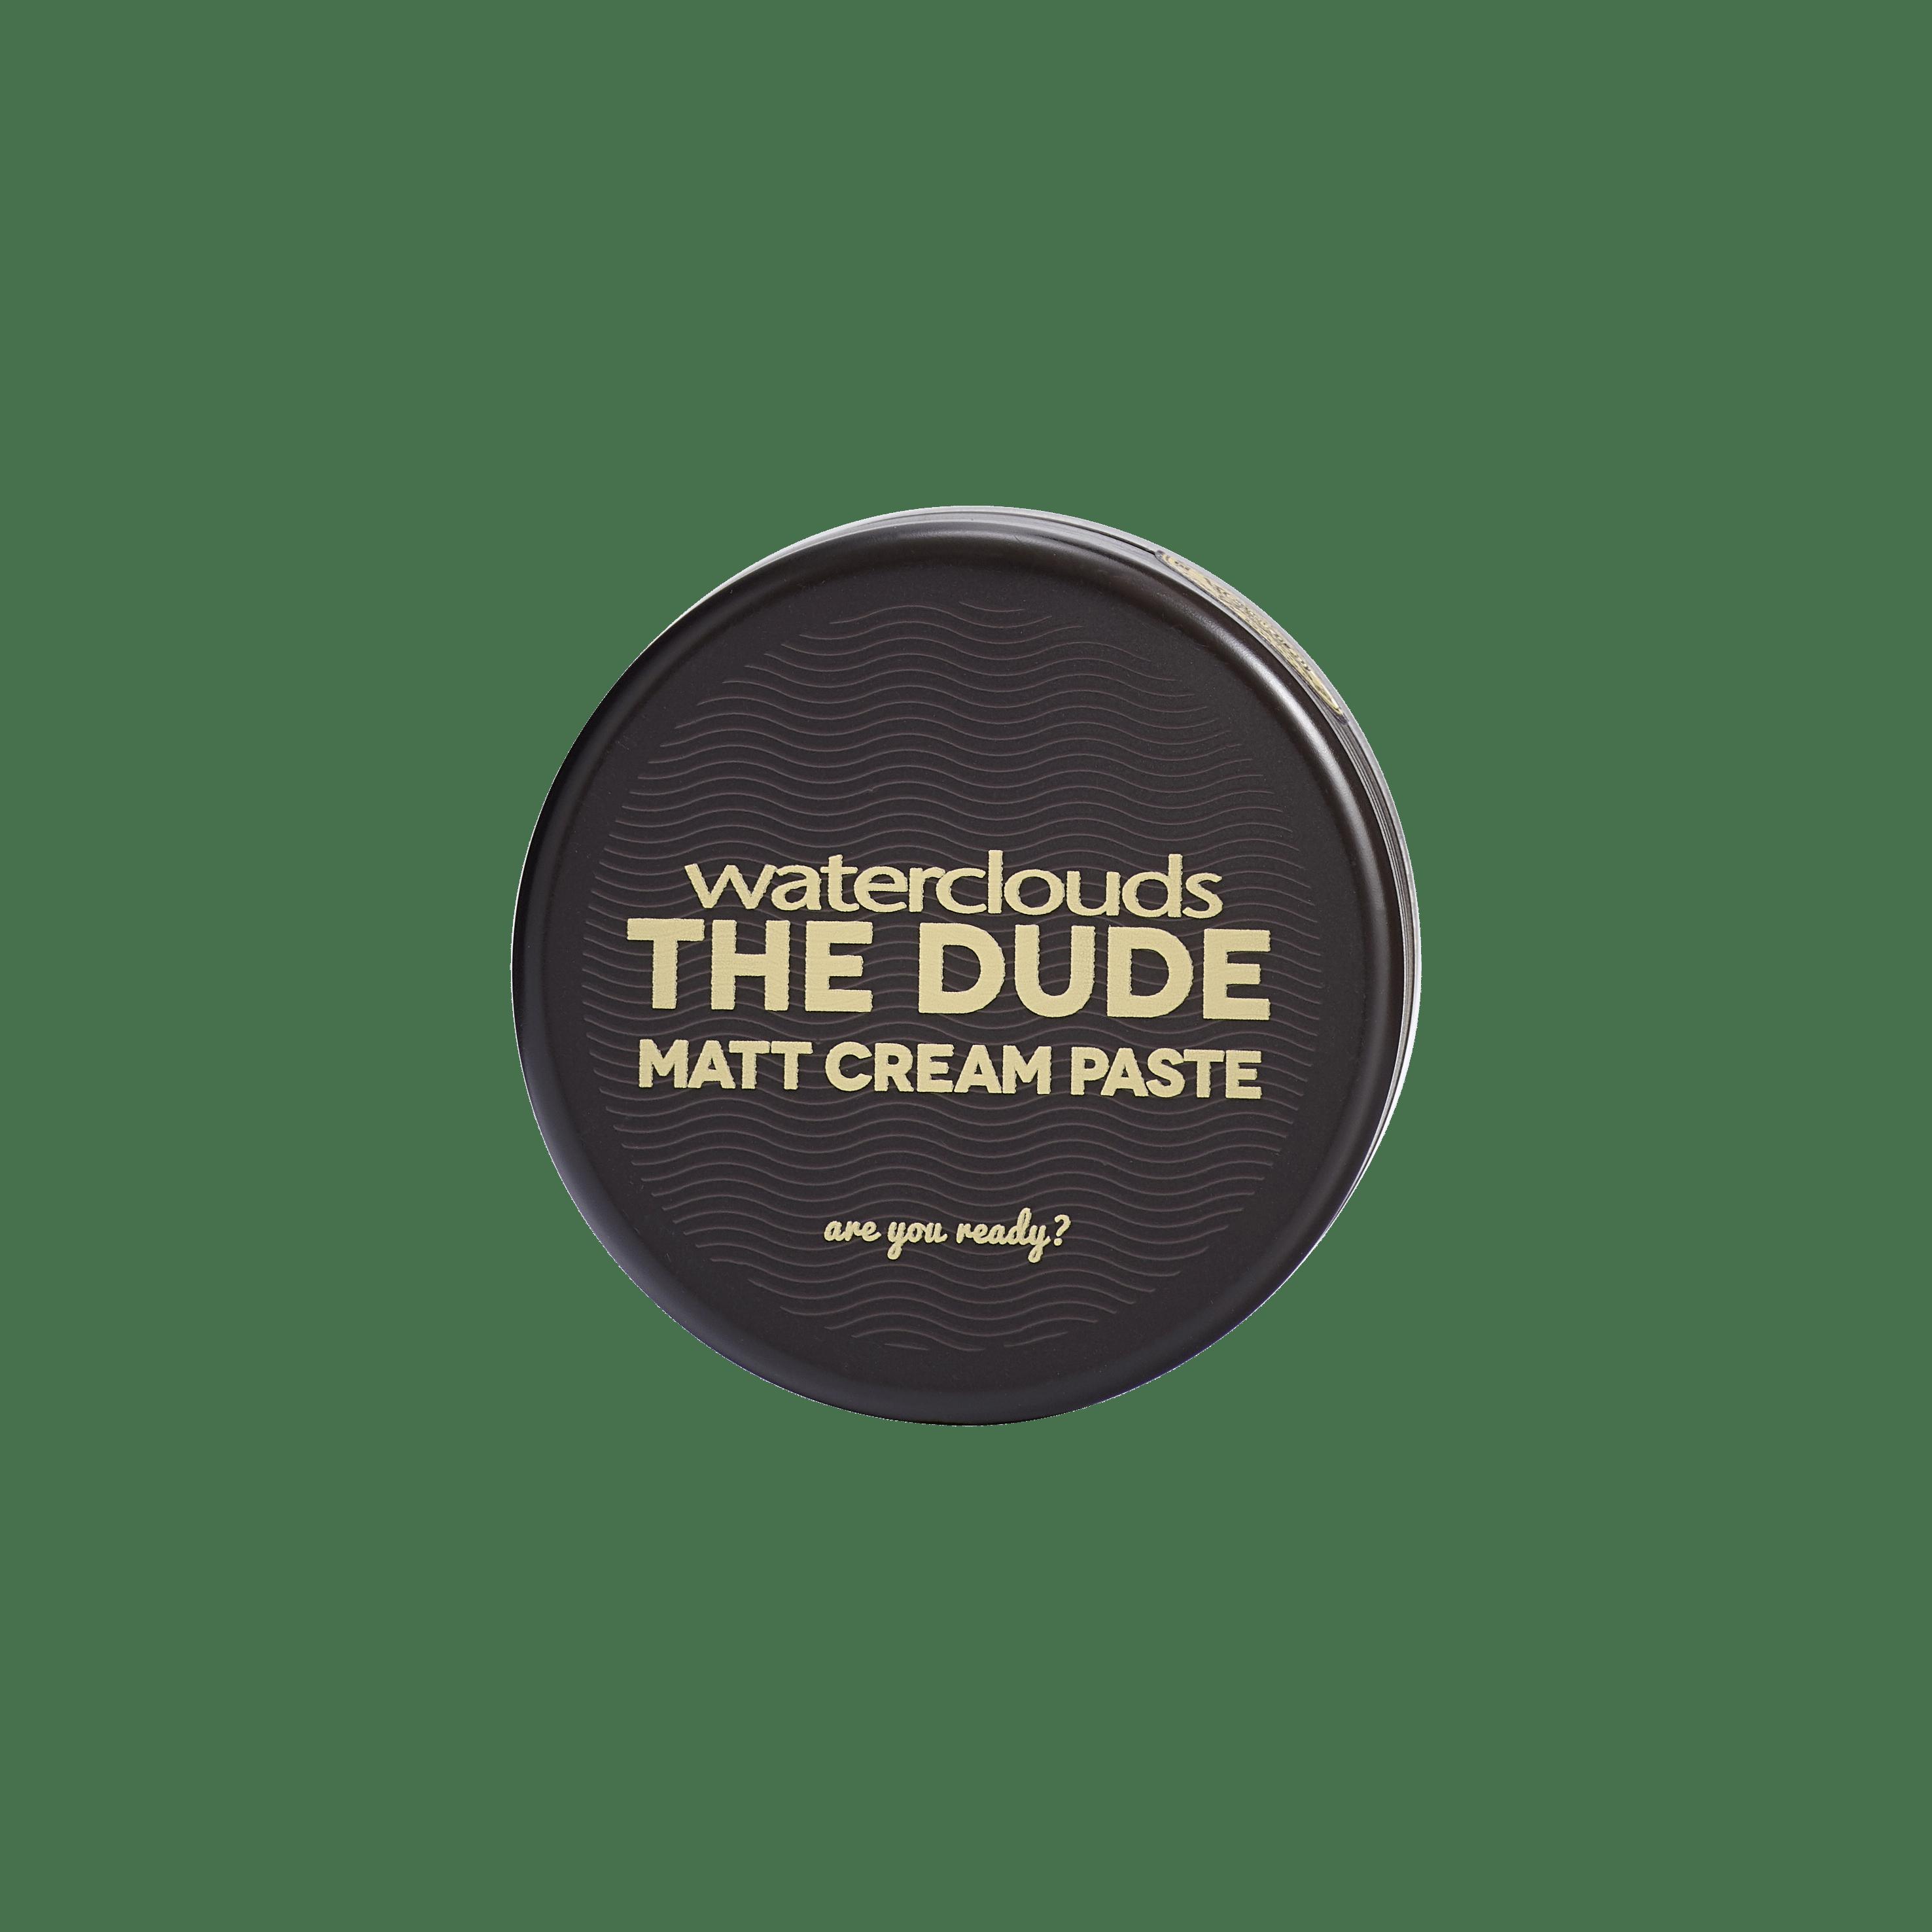 Matt Cream Paste 100ml – Waterclouds The Dude